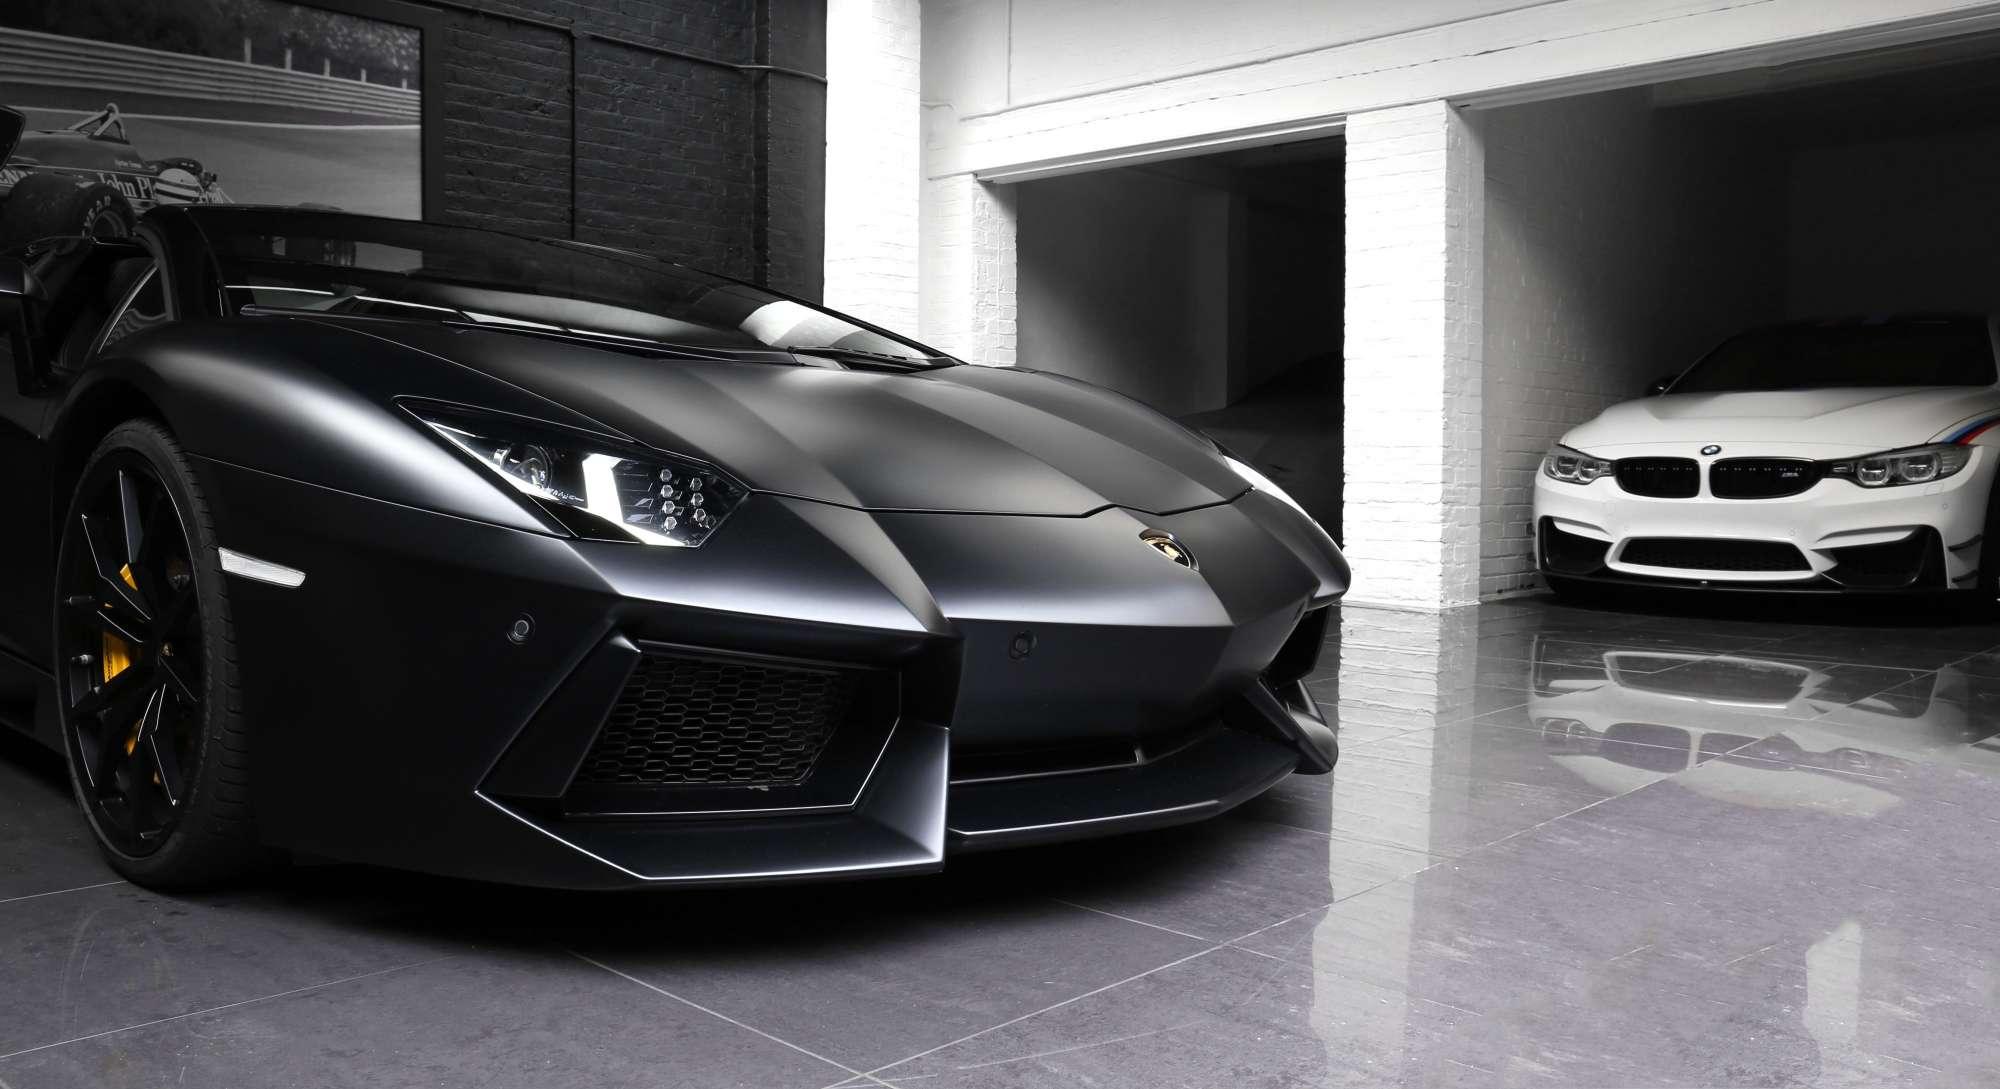 Lhd Lamborghini Aventador Roadster Pegasus Auto House